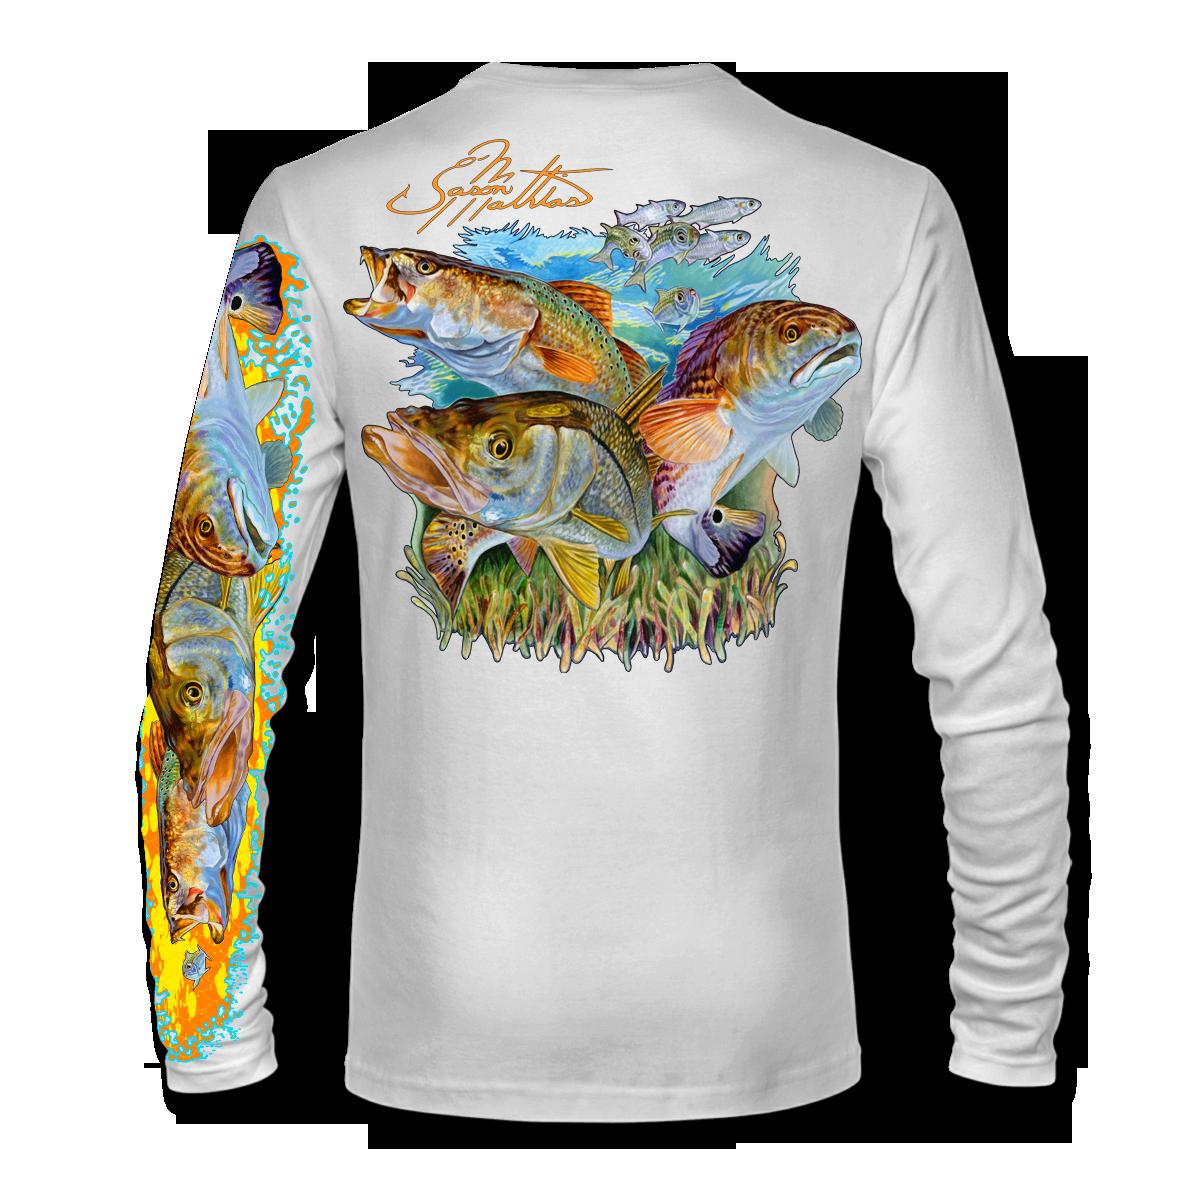 inshore-slam-shirt-white-jason-mathias-snook-trout-redfish.png